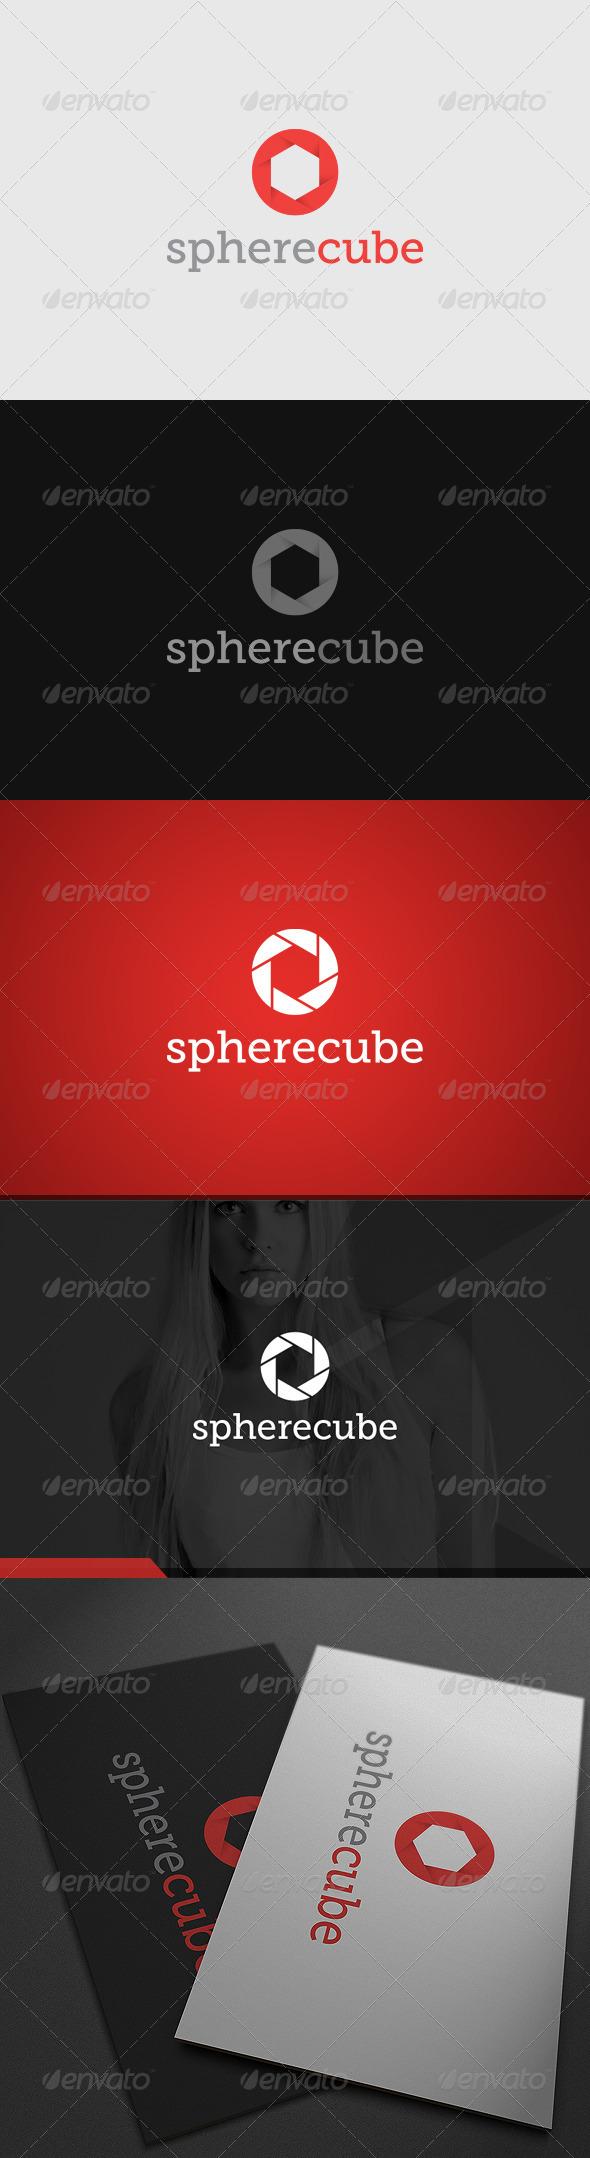 SphereCube - Symbols Logo Templates